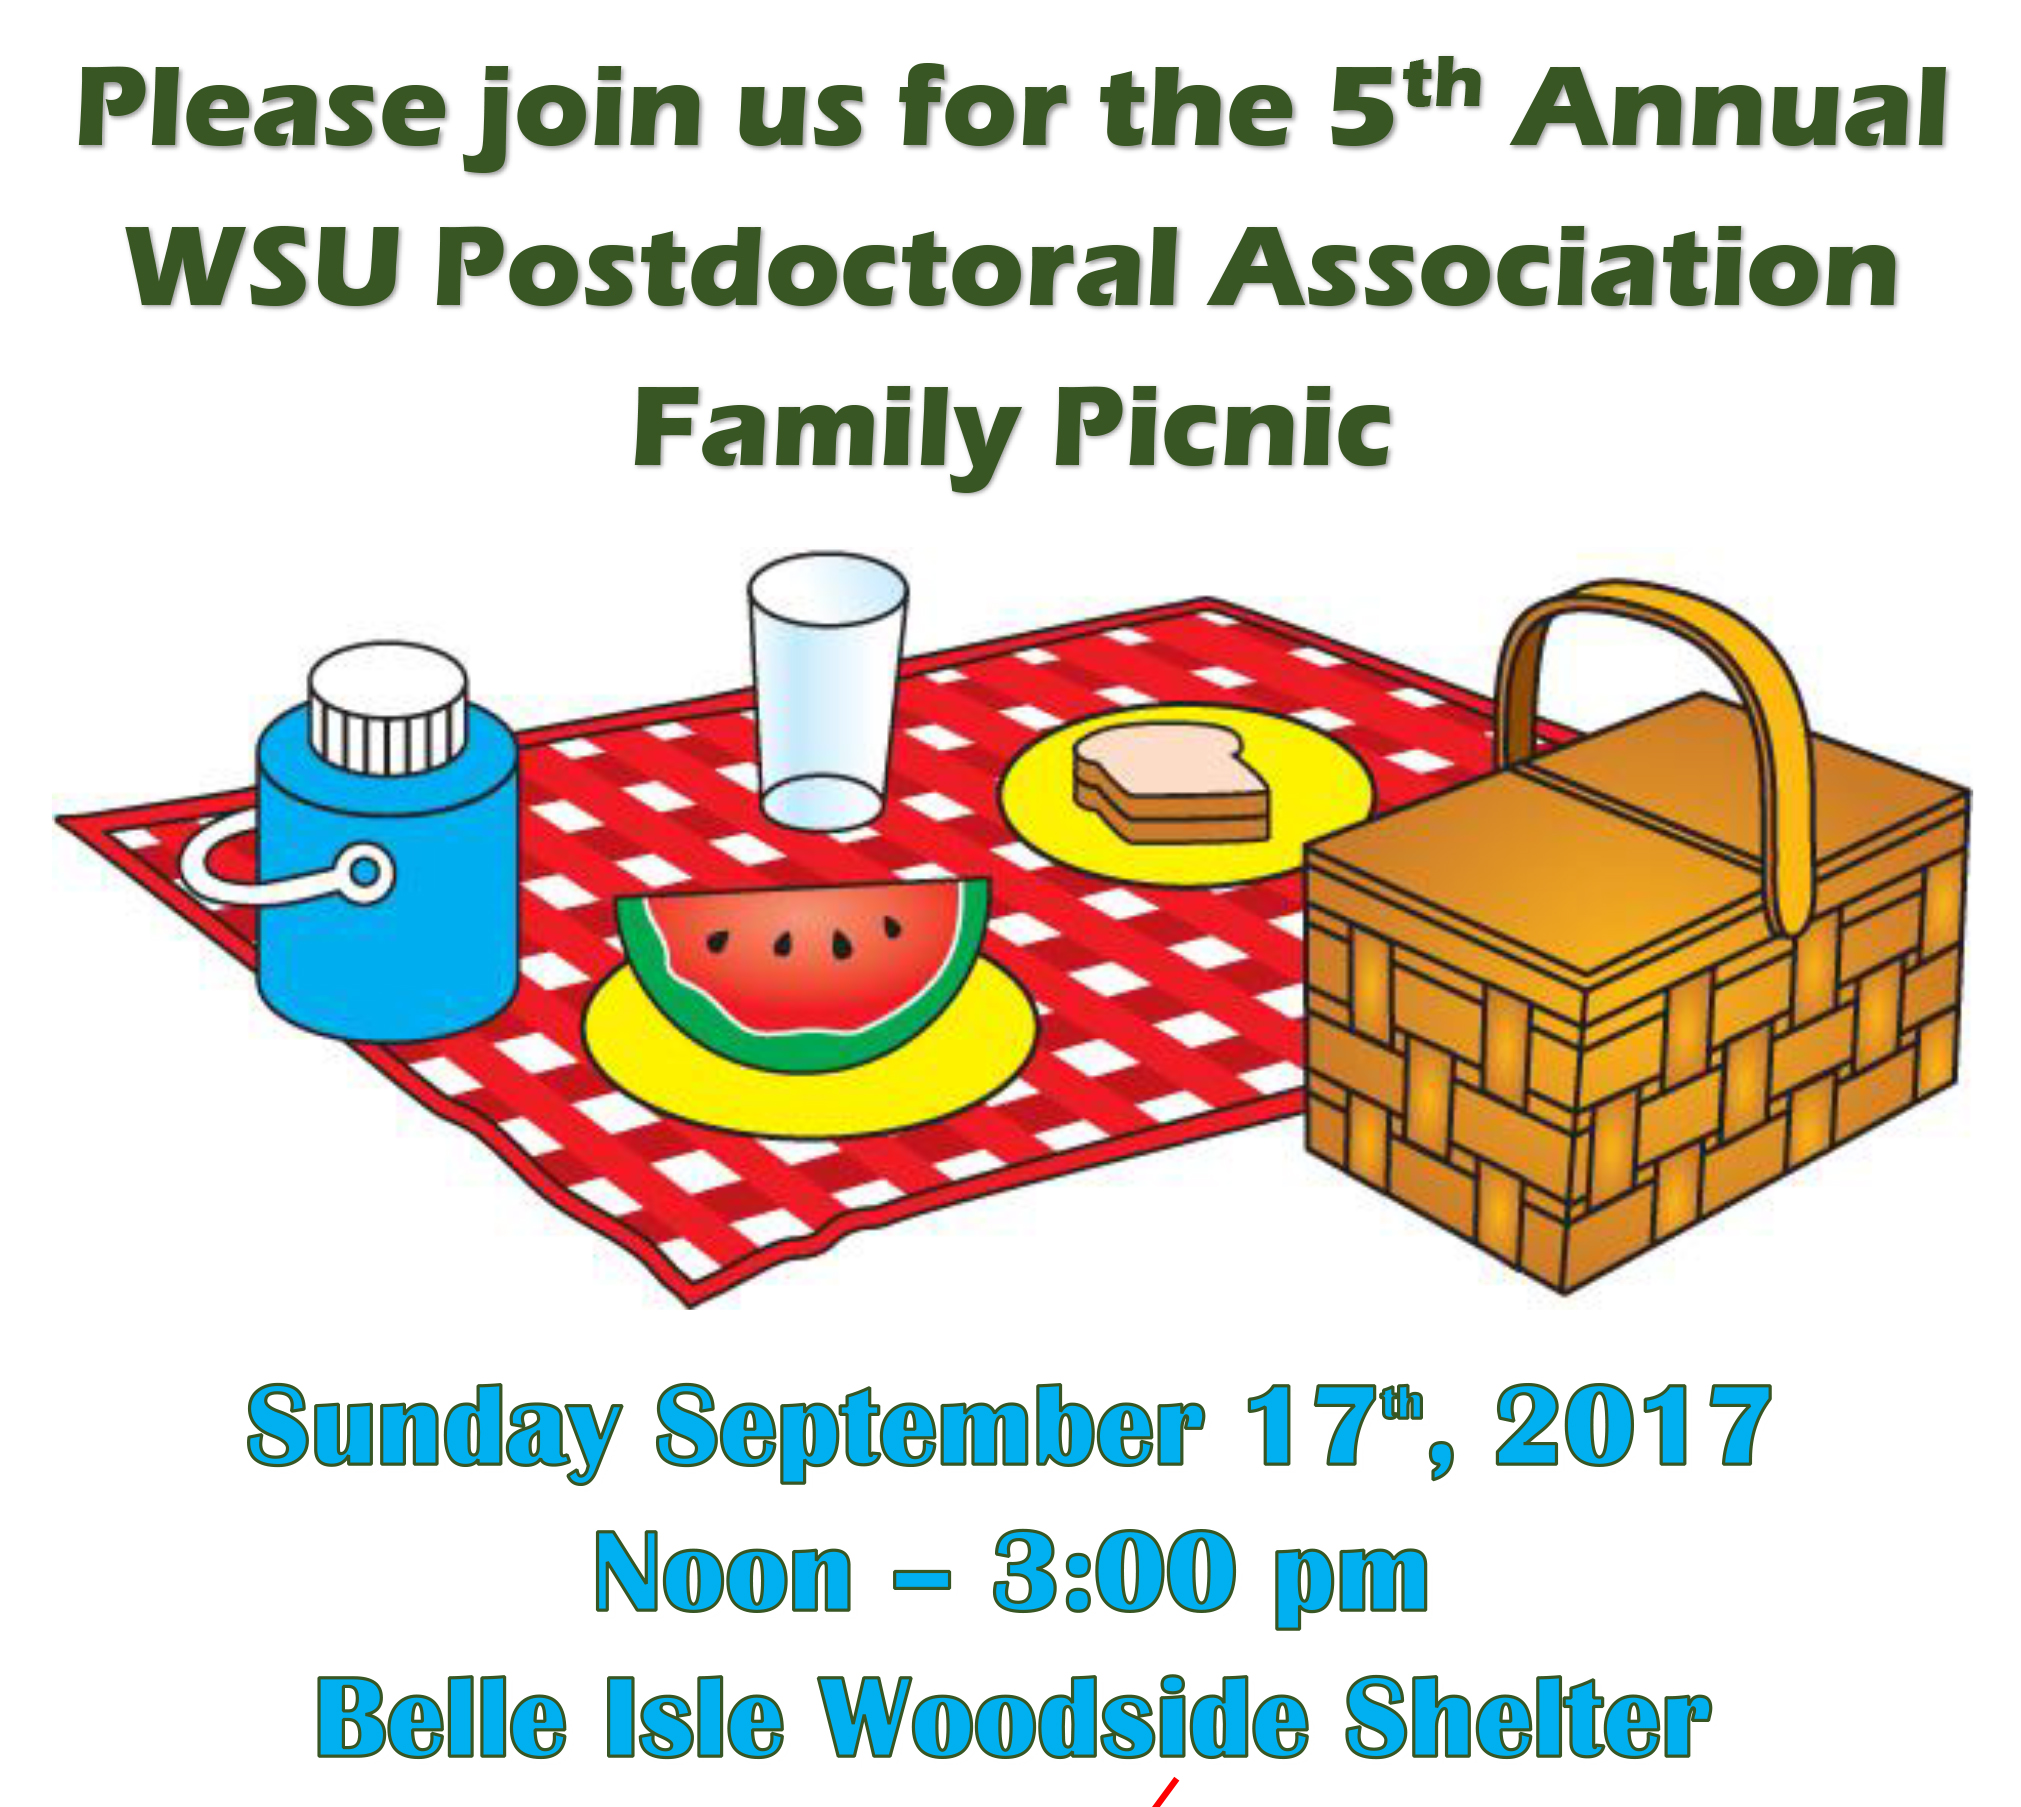 Sept. 17: WSU Postdoctoral Association Annual Picnic